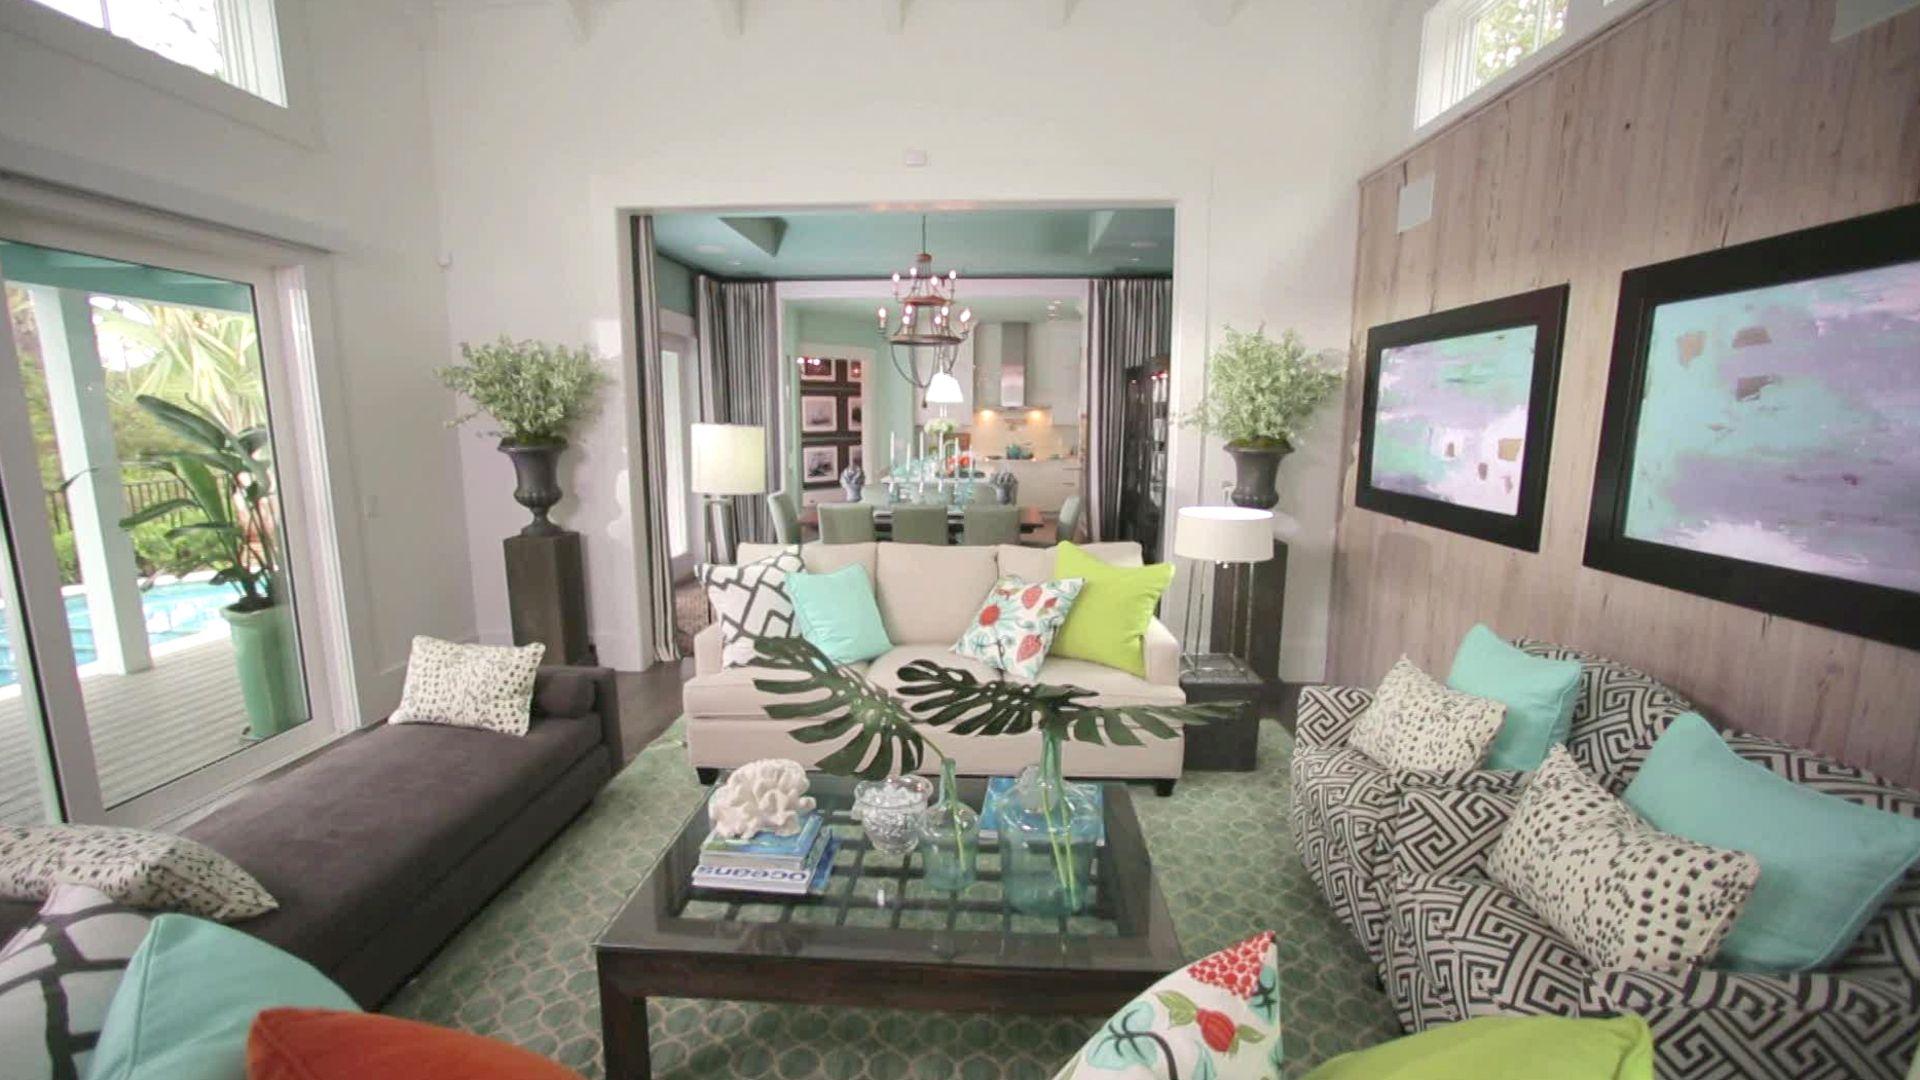 Hgtv Design Ideas Living Room Design Ideas Living Room Candice Olson  Httpclubmaraton